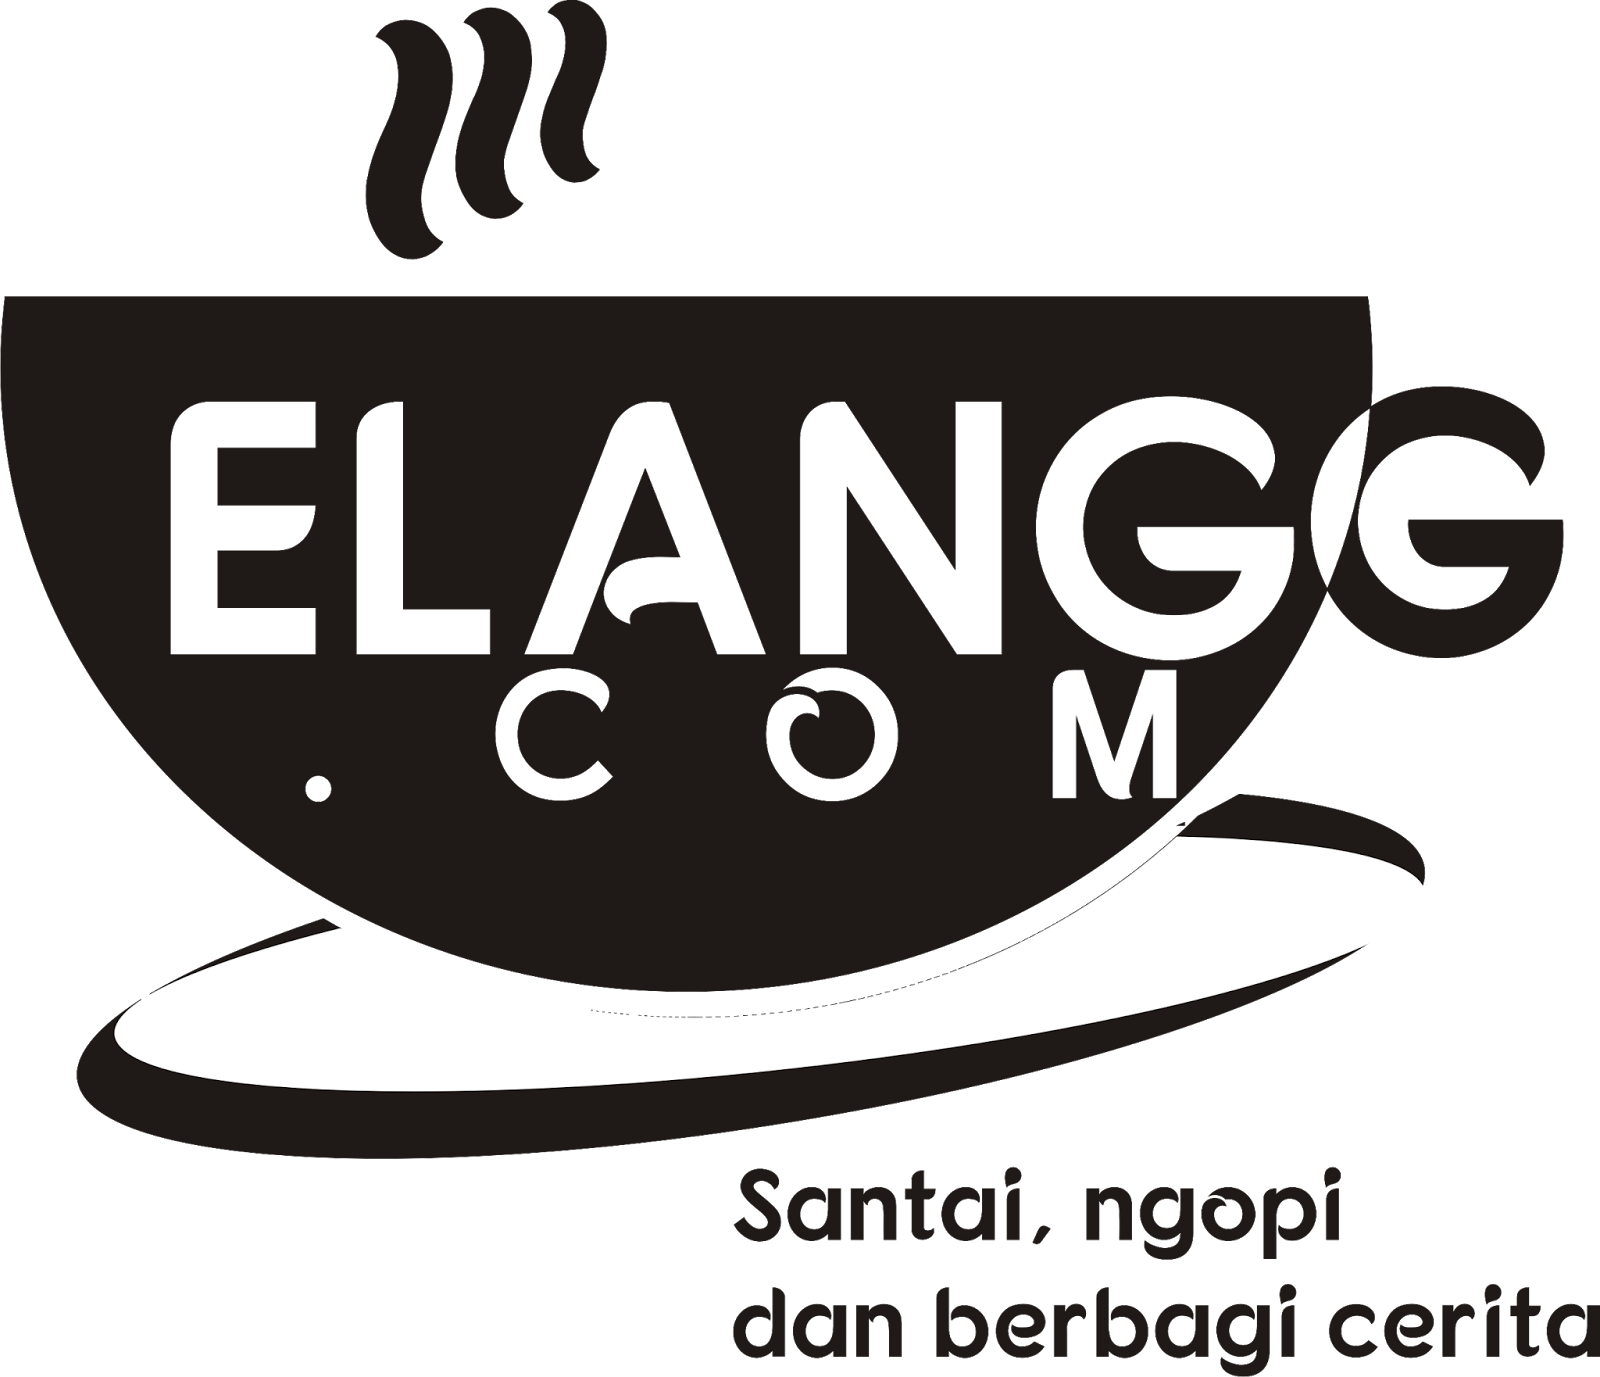 elangg.com